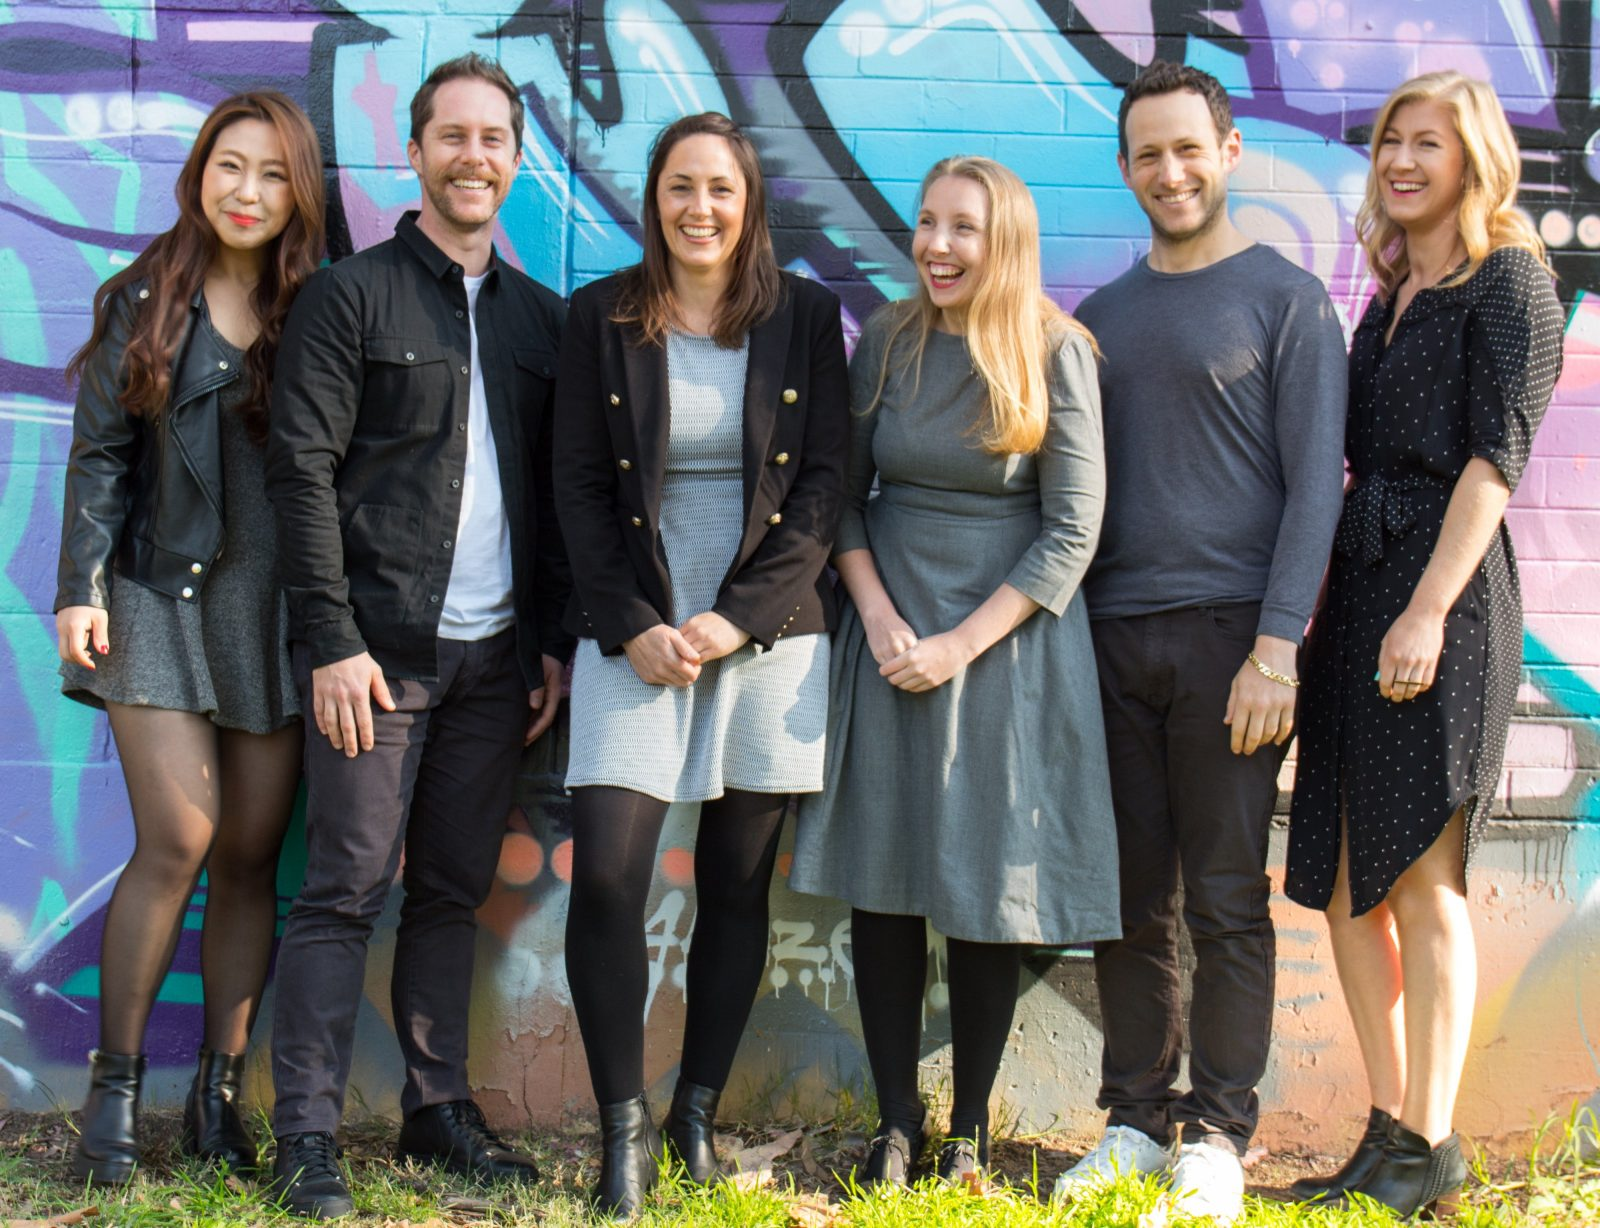 Melbourne Private Tours team